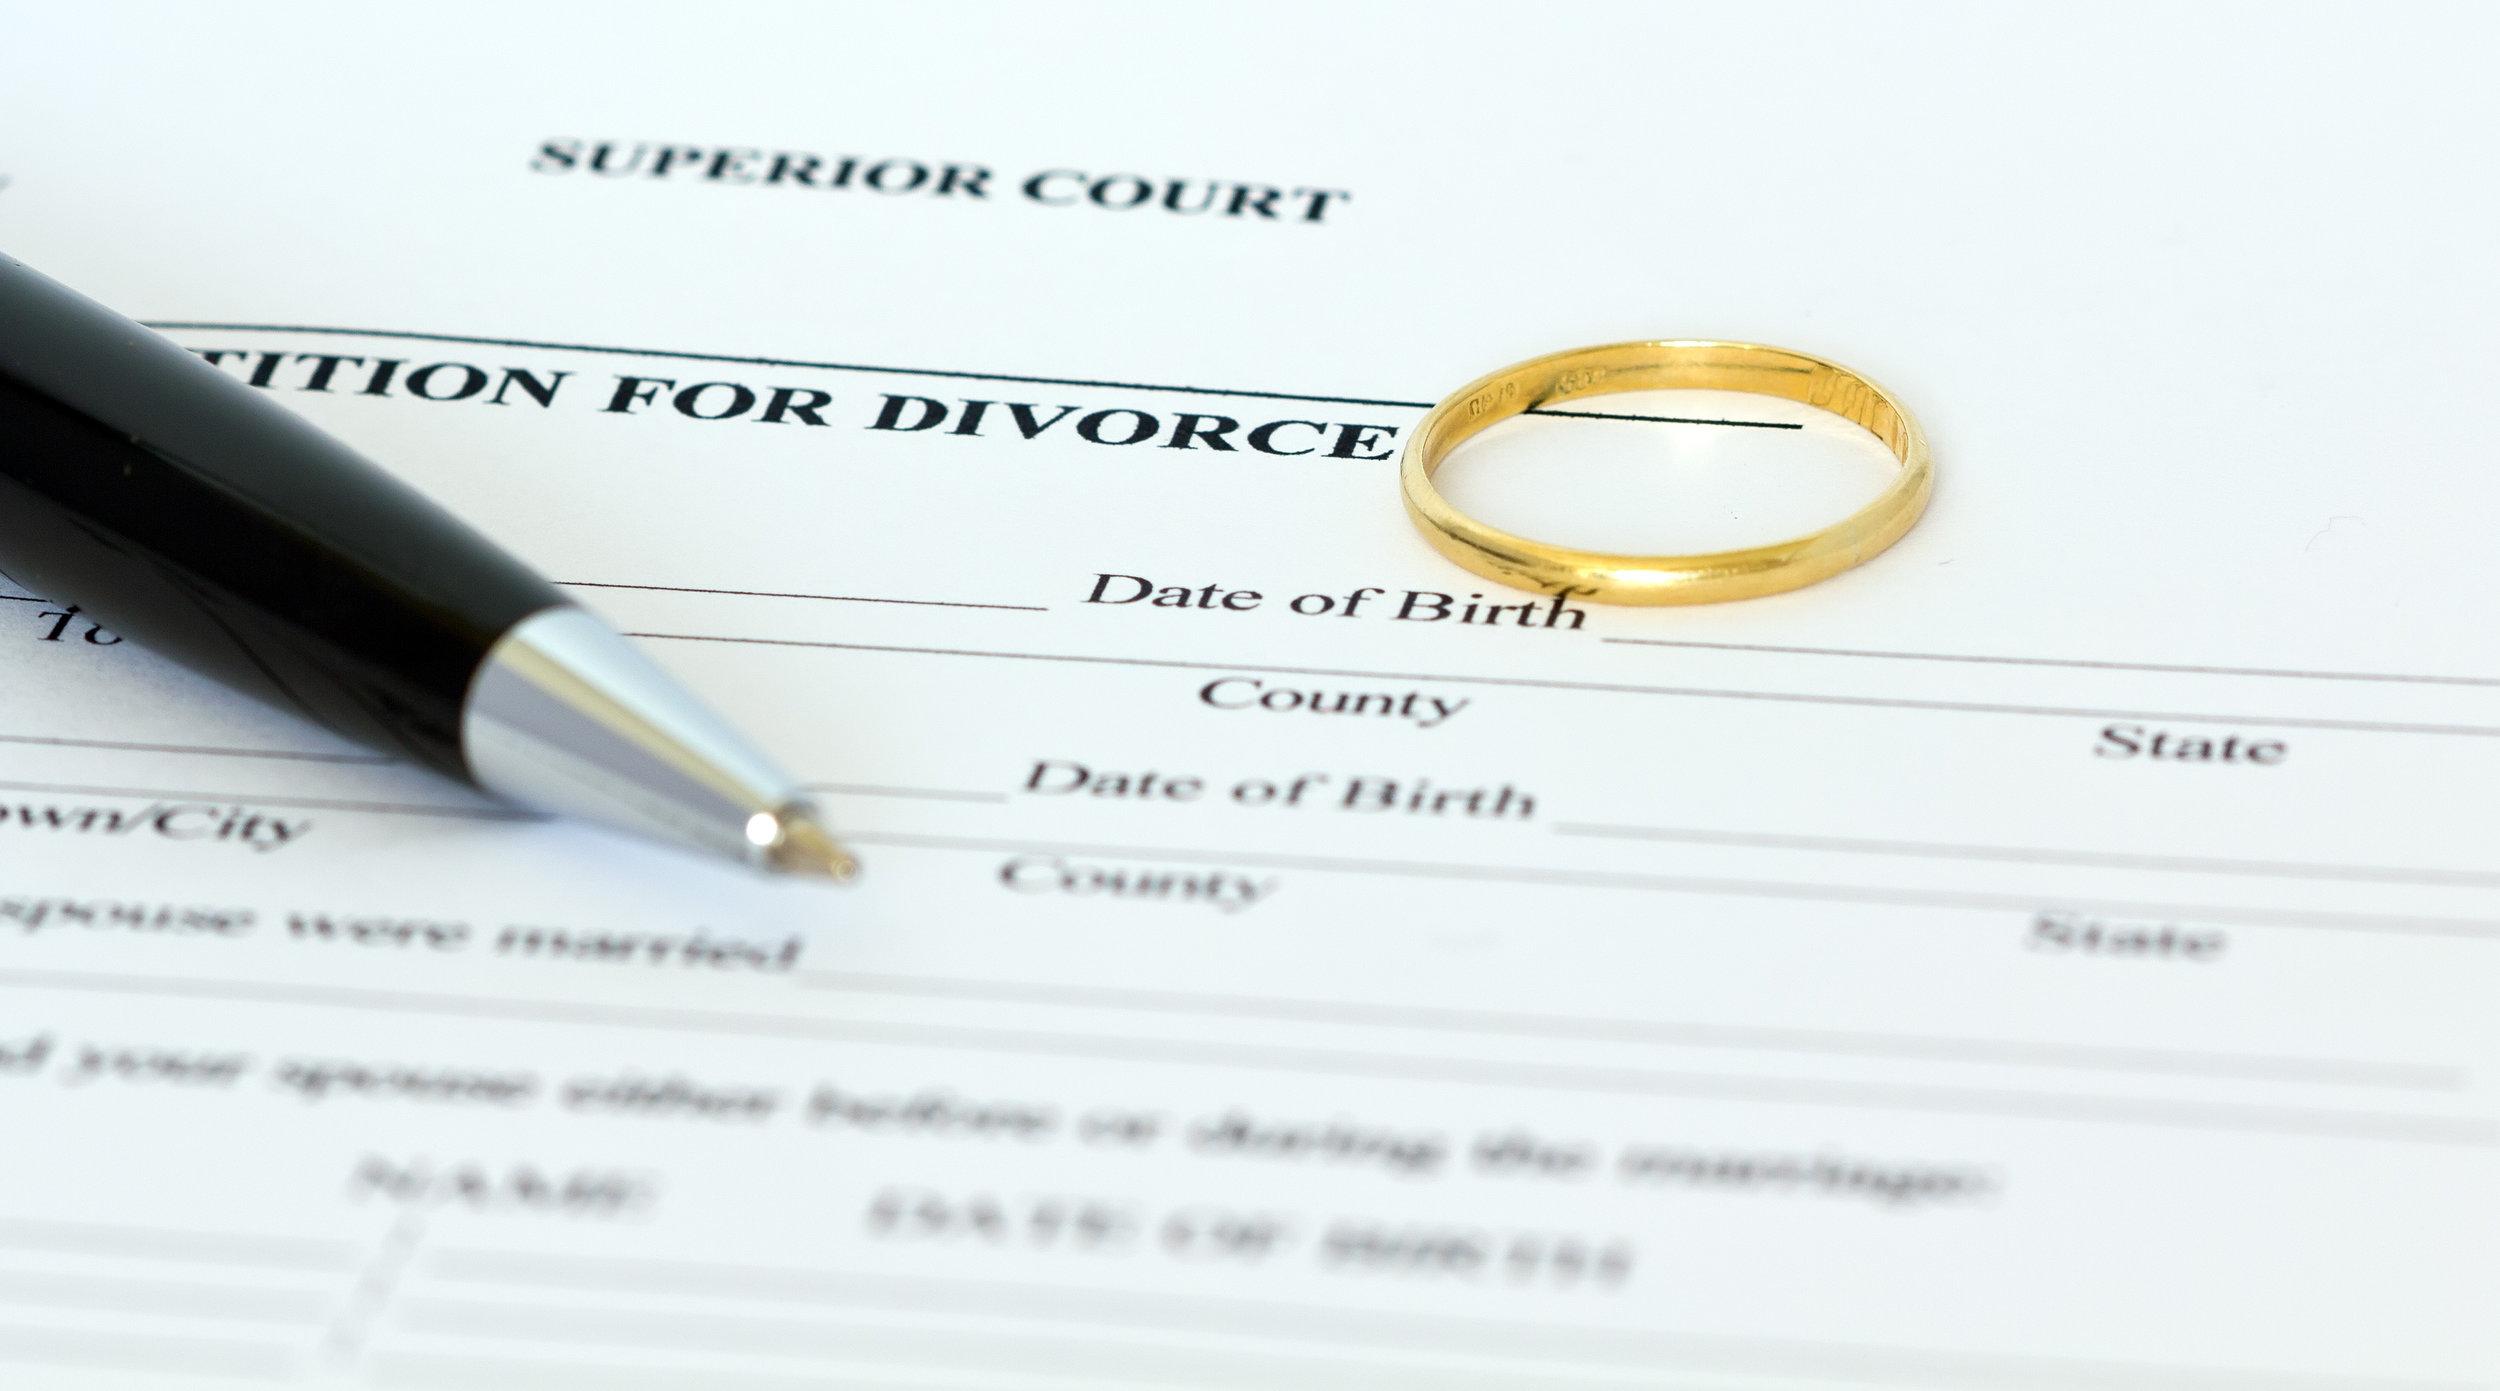 File for Divorce DC Maryland Virginia